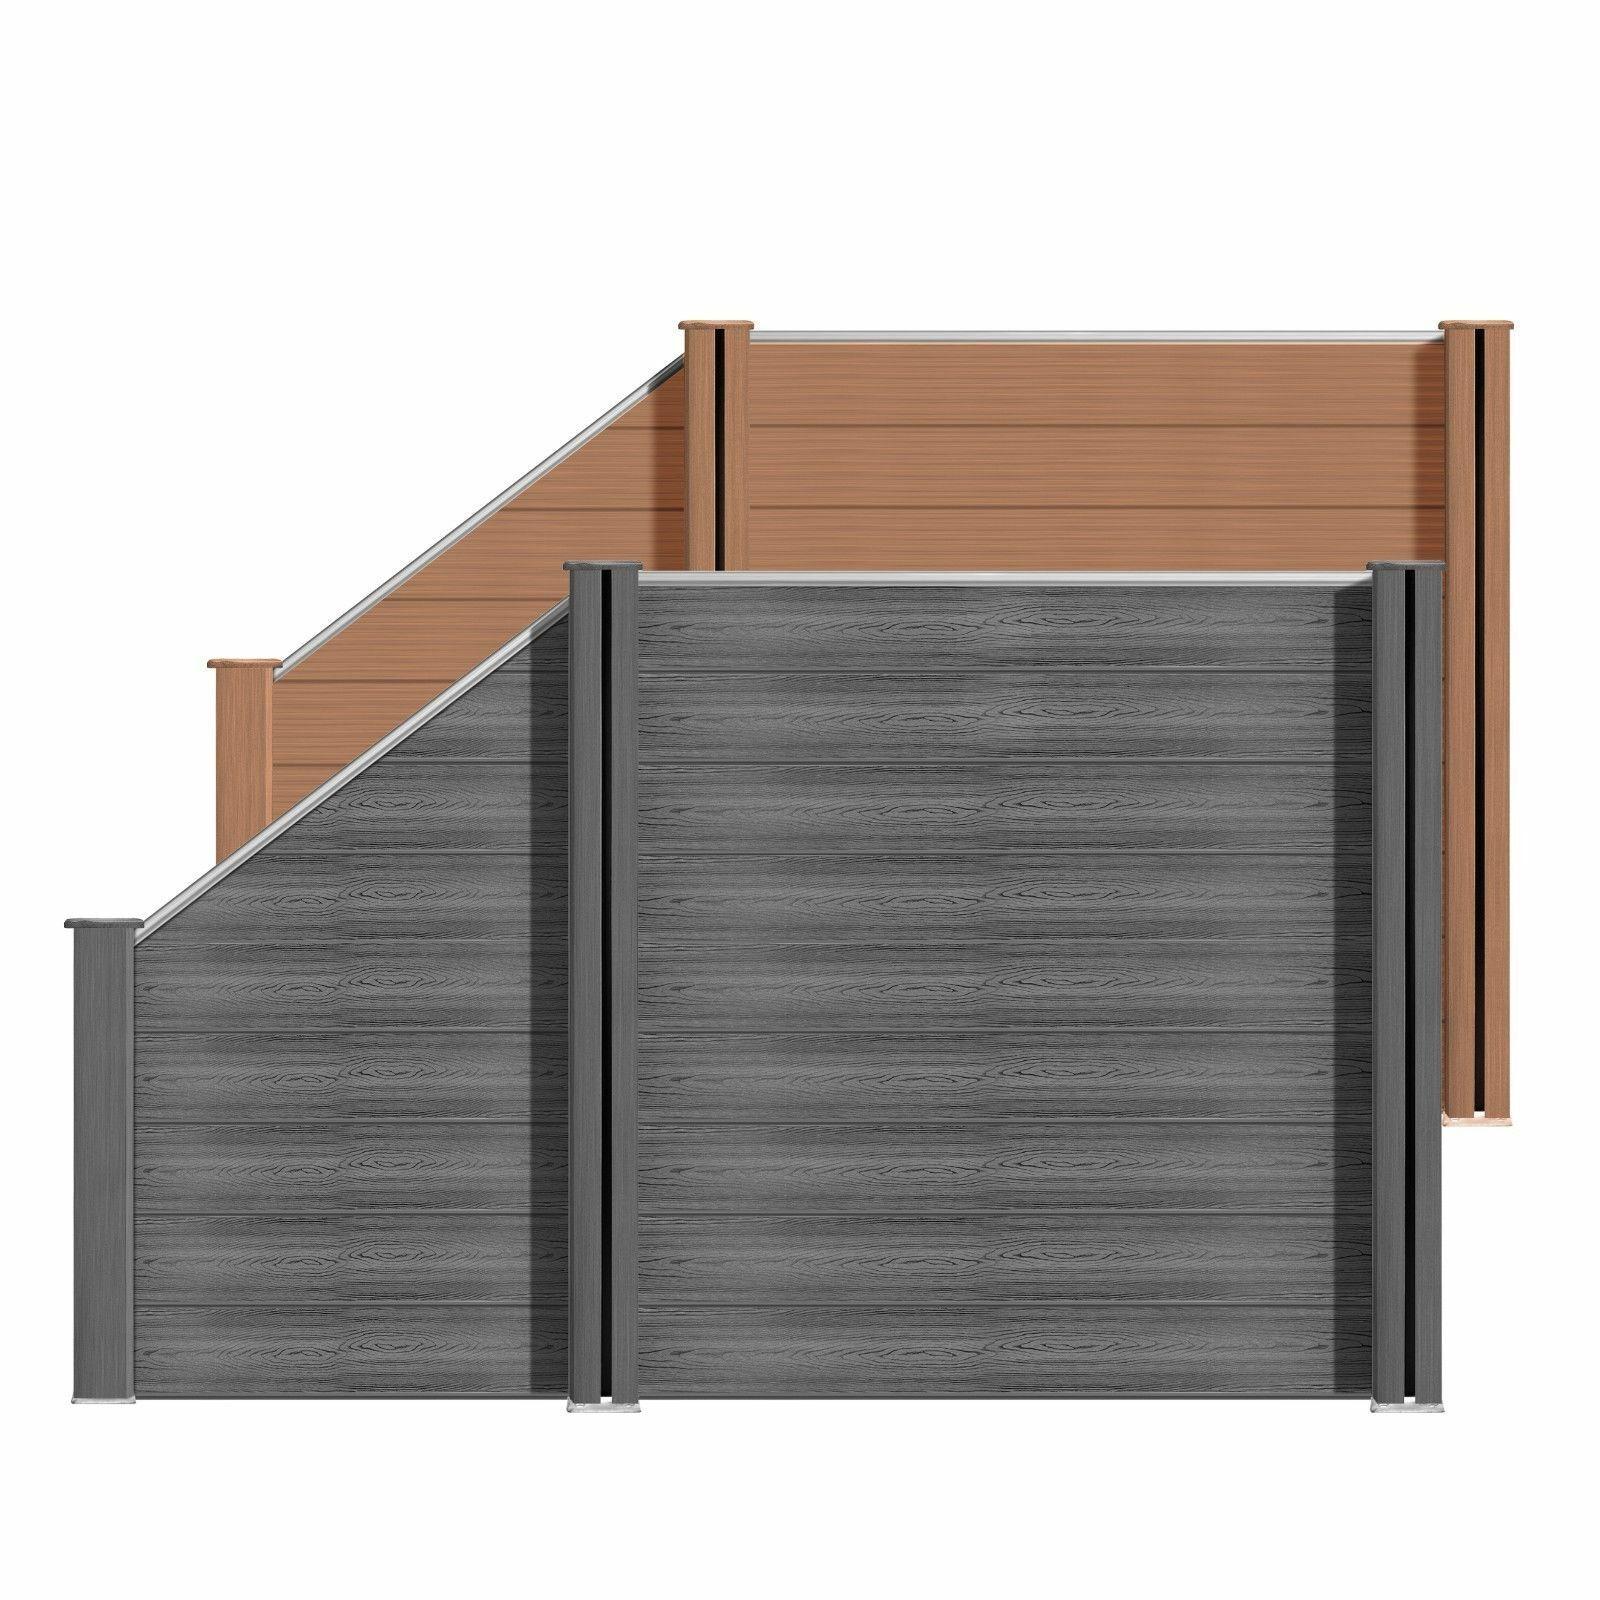 Sichtschutzzaun Bohlenzaun Element Holz Ki Grau 180x180cm